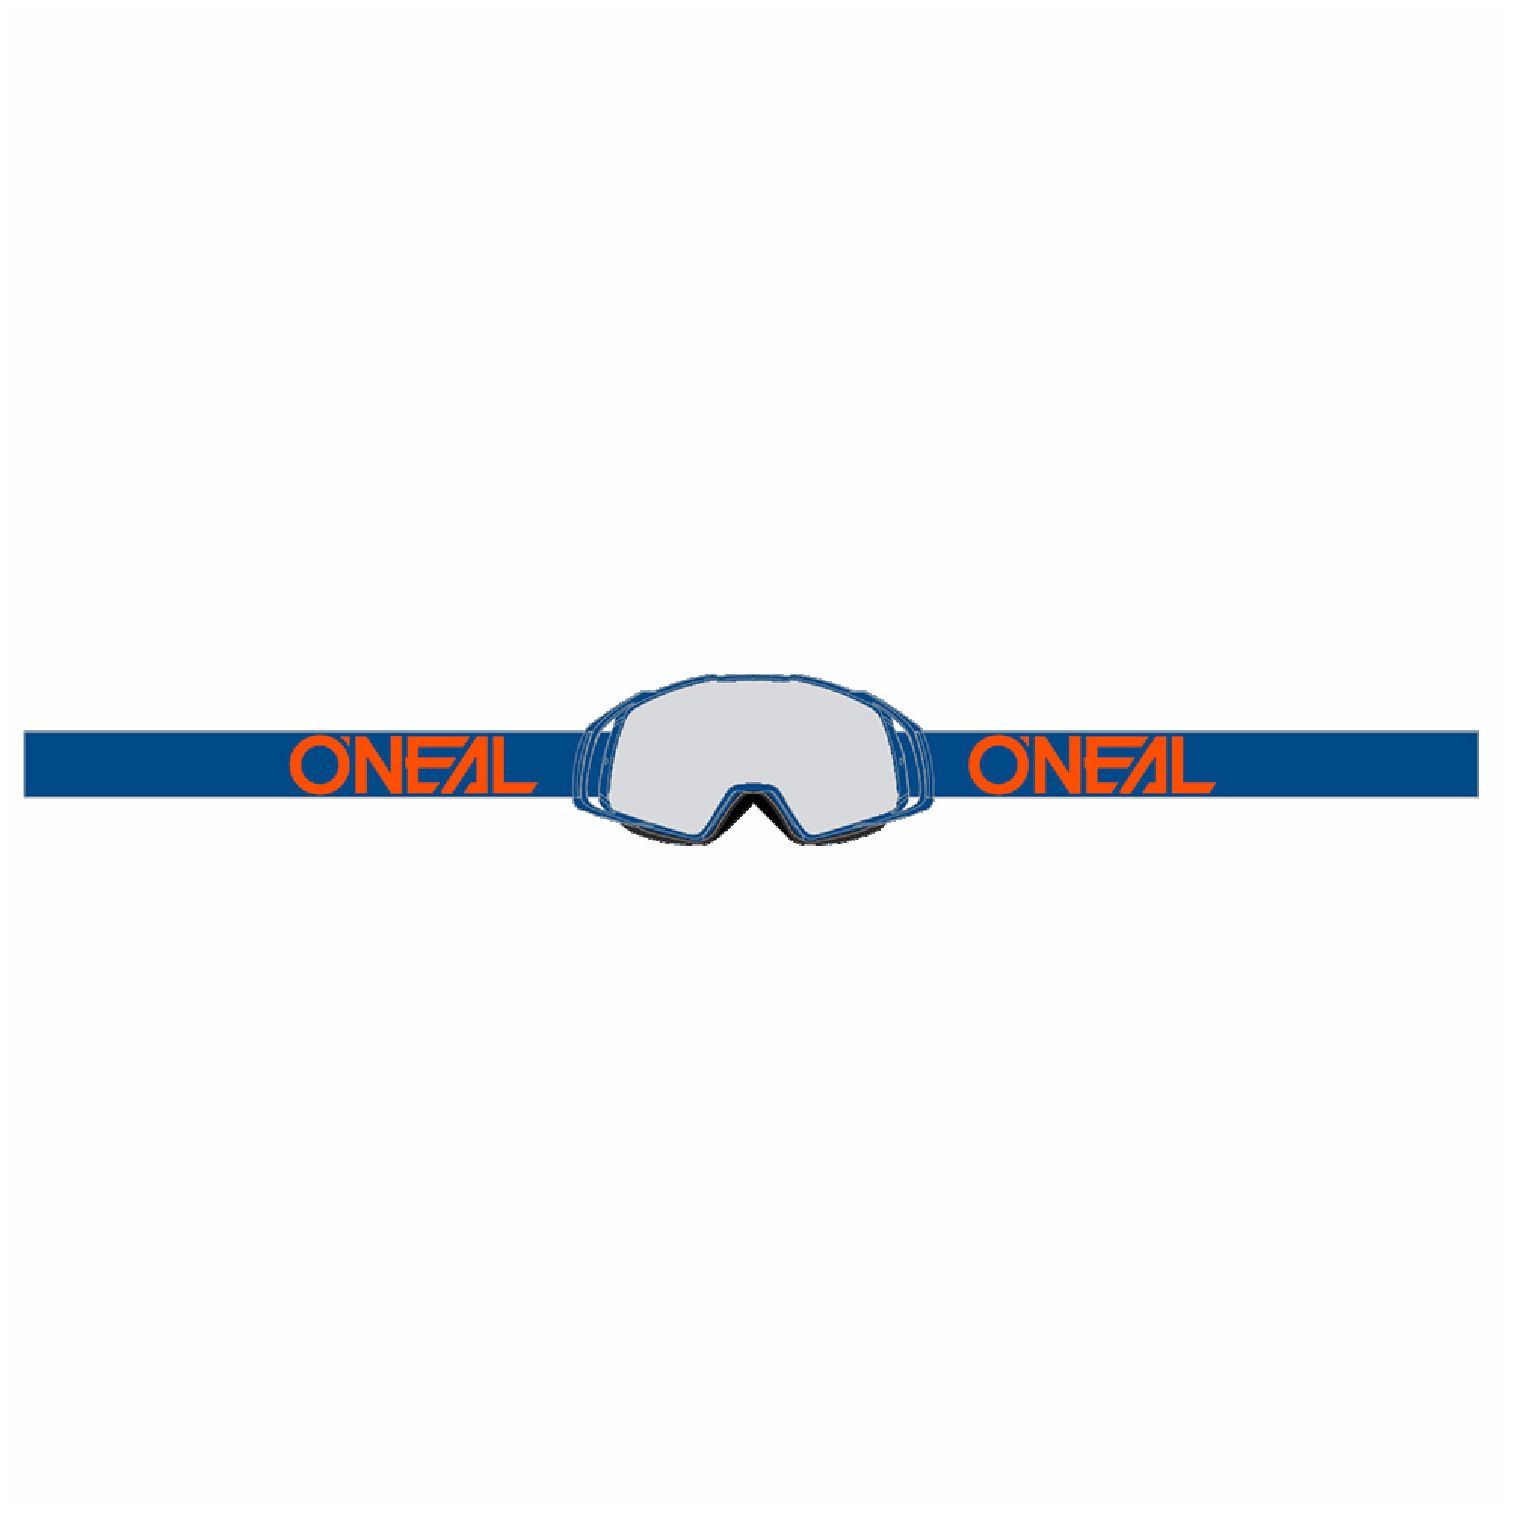 Masque Cross O'neal B-20 - Flat Bleu Orange - Ecran Clair -